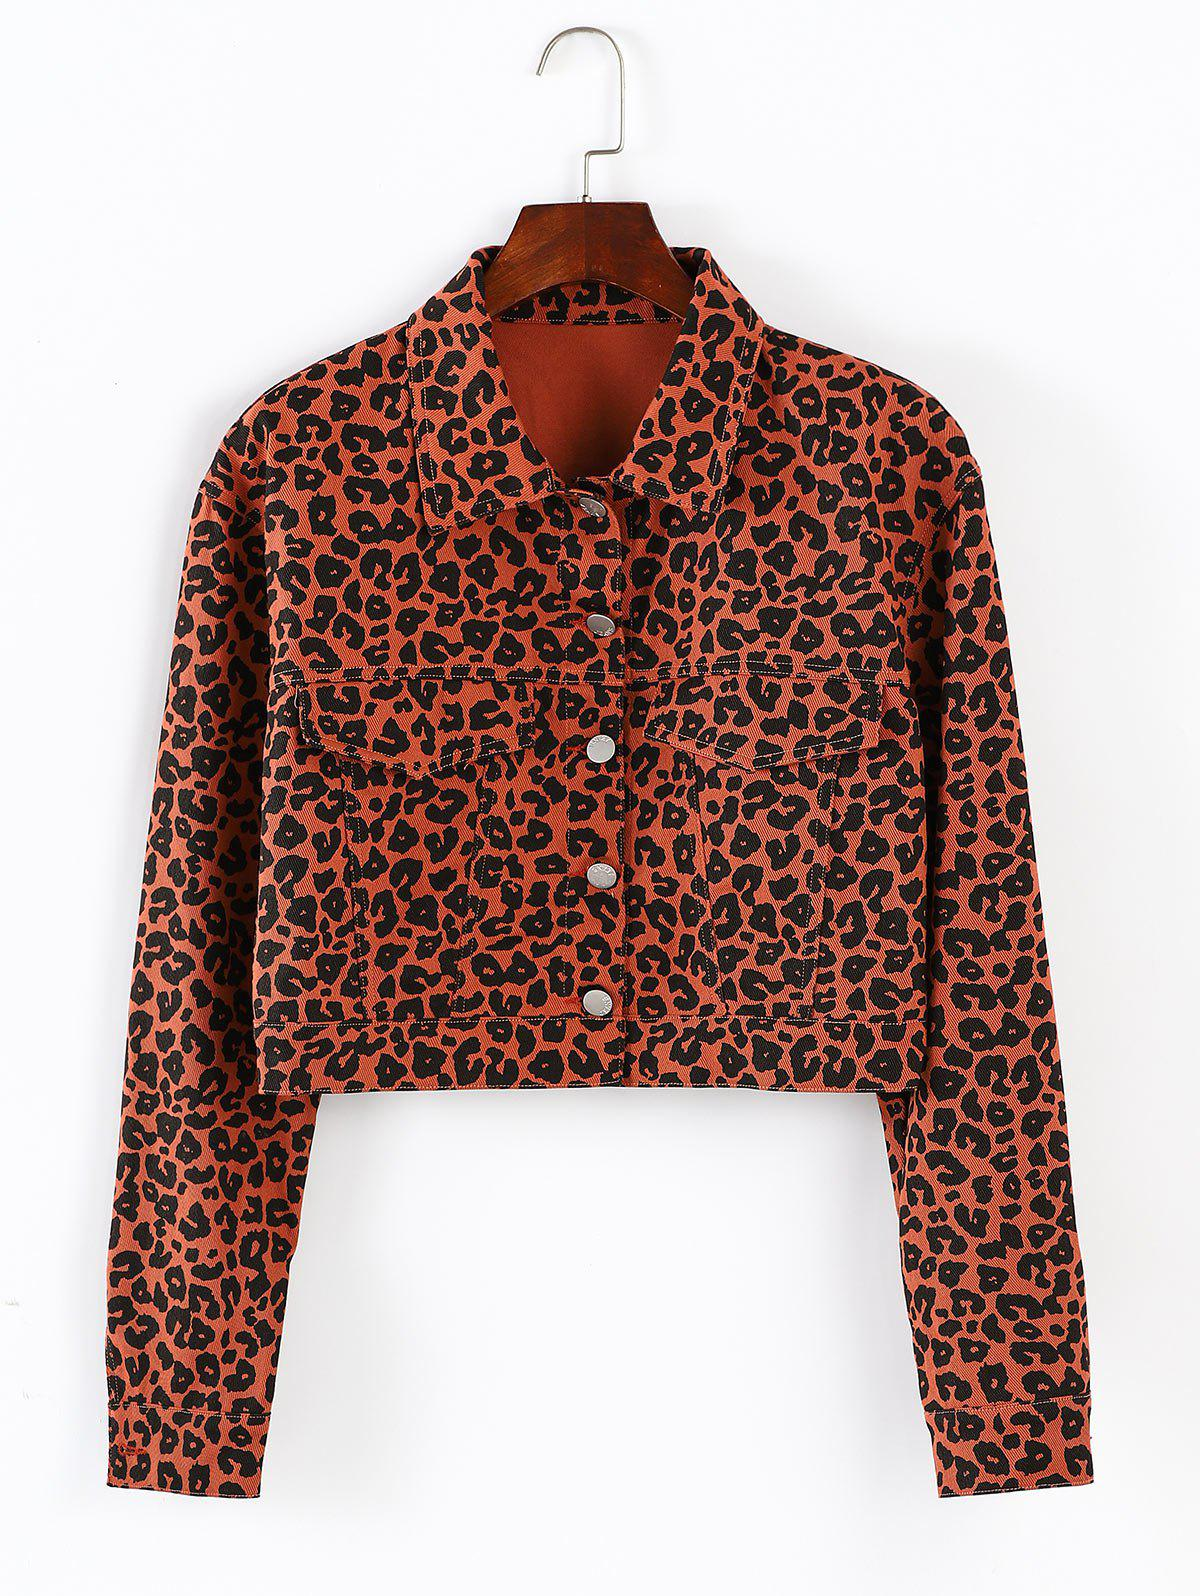 ZAFUL Button Up Leopard Cropped Jacket